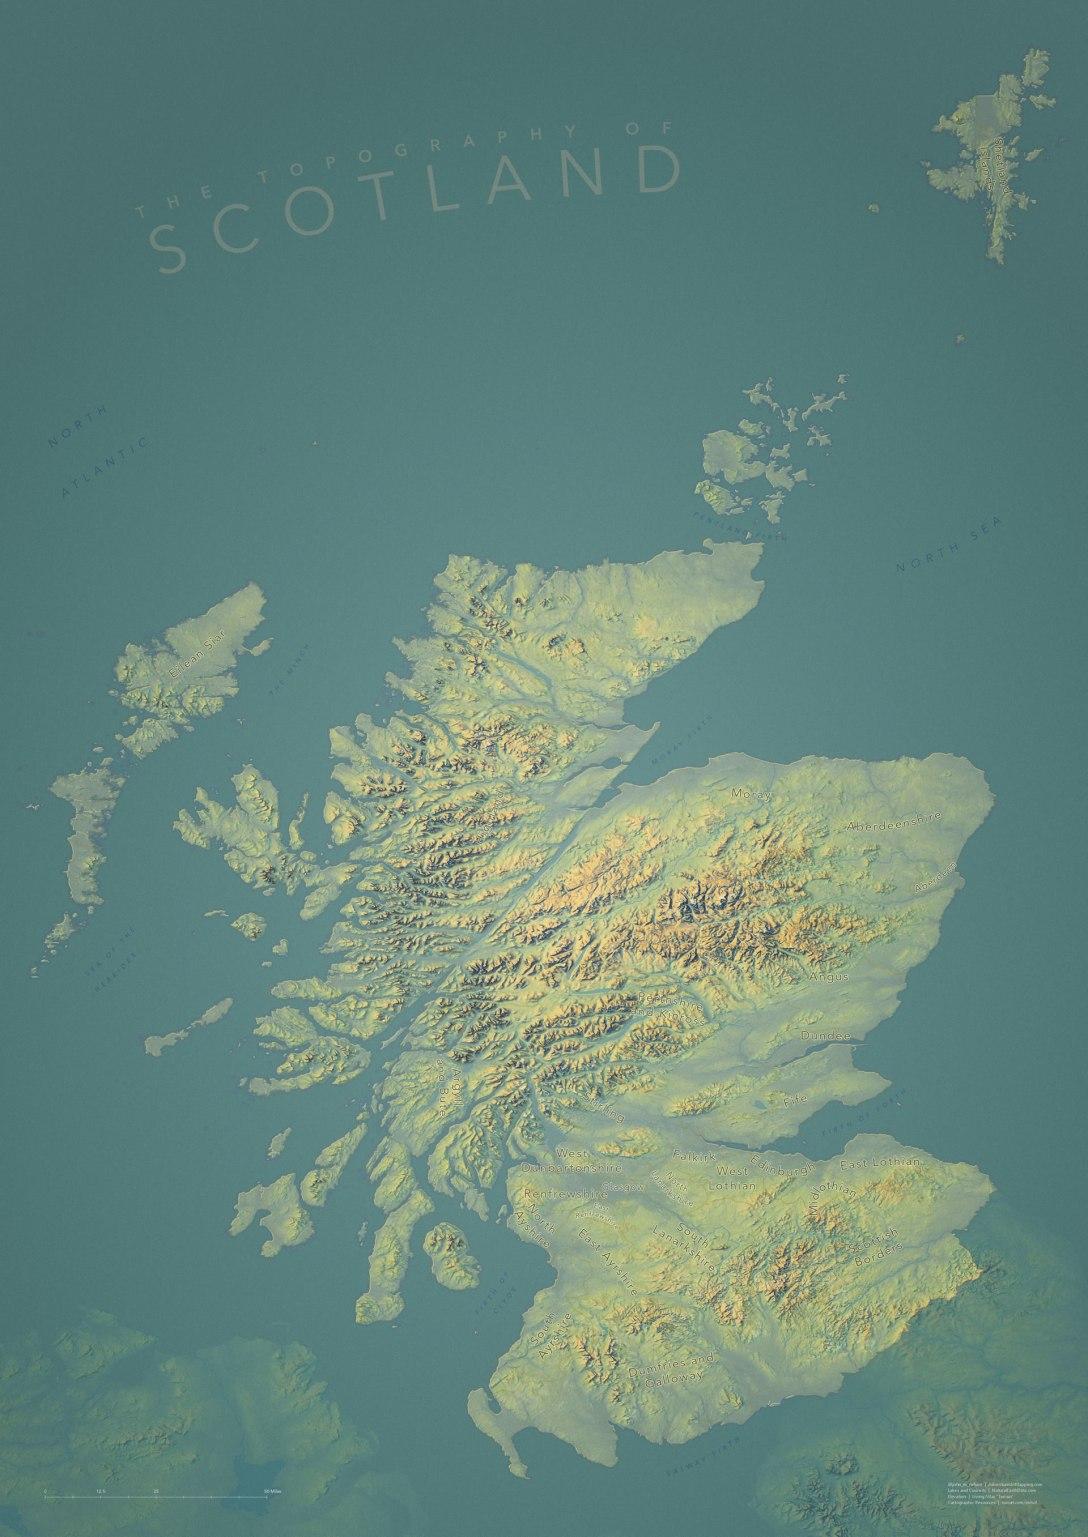 Imhof_Scotland_print2